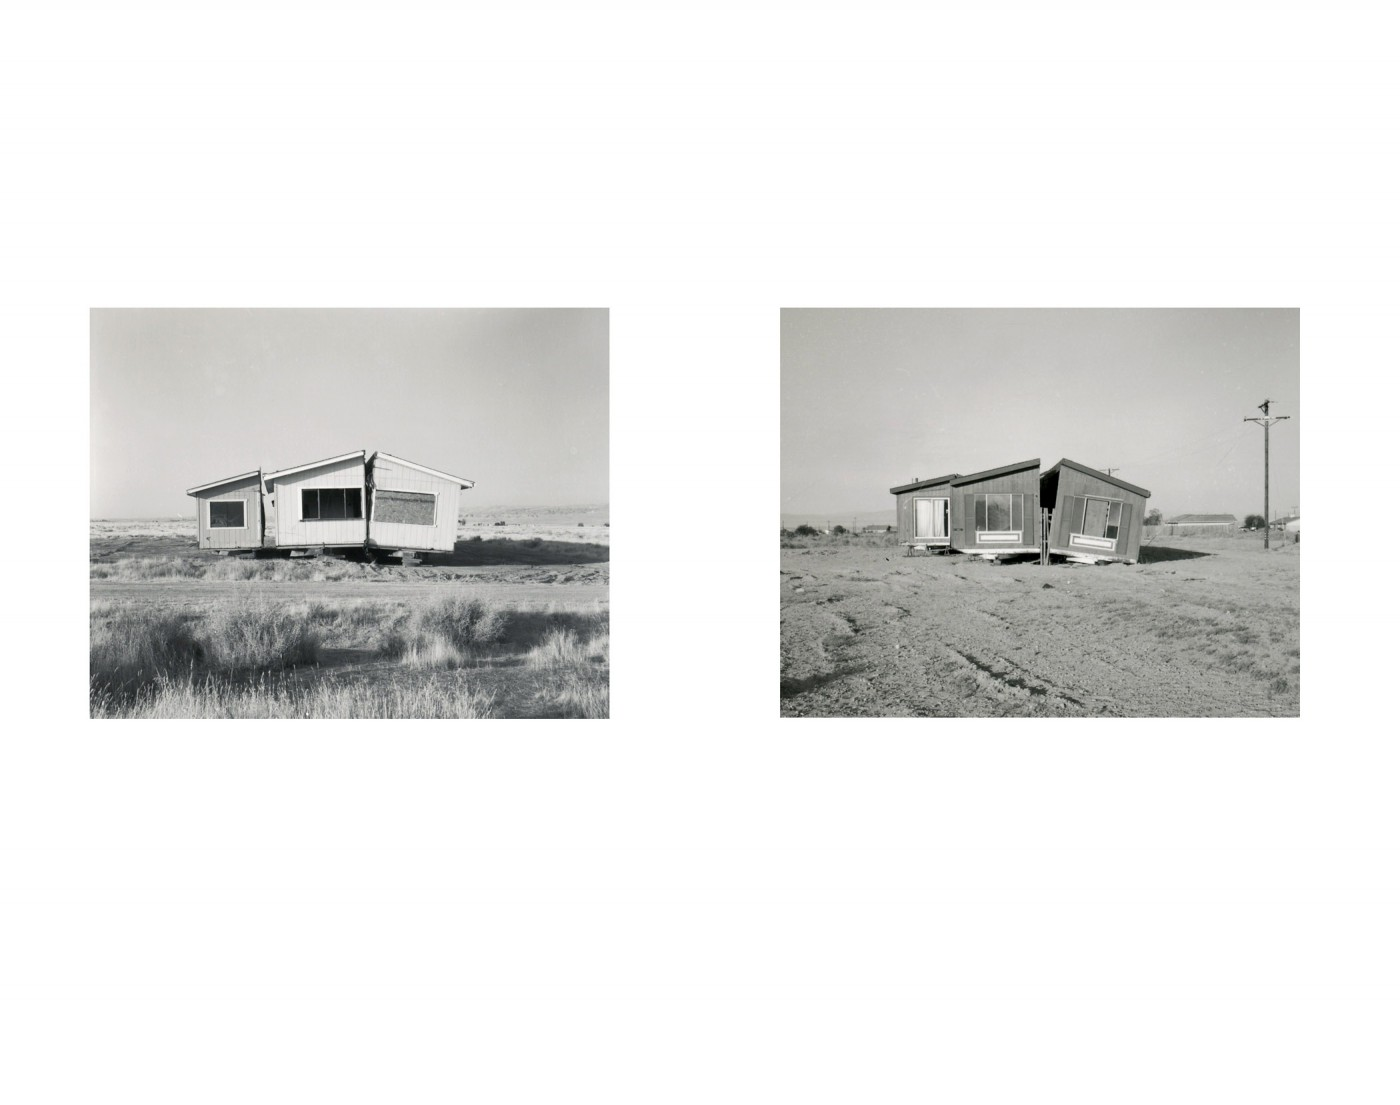 Mark Ruwedel, </span><span><em>Splitting</em>, </span><span>2013 Courtesy of the artist, Gallery Luisotti and Art 45